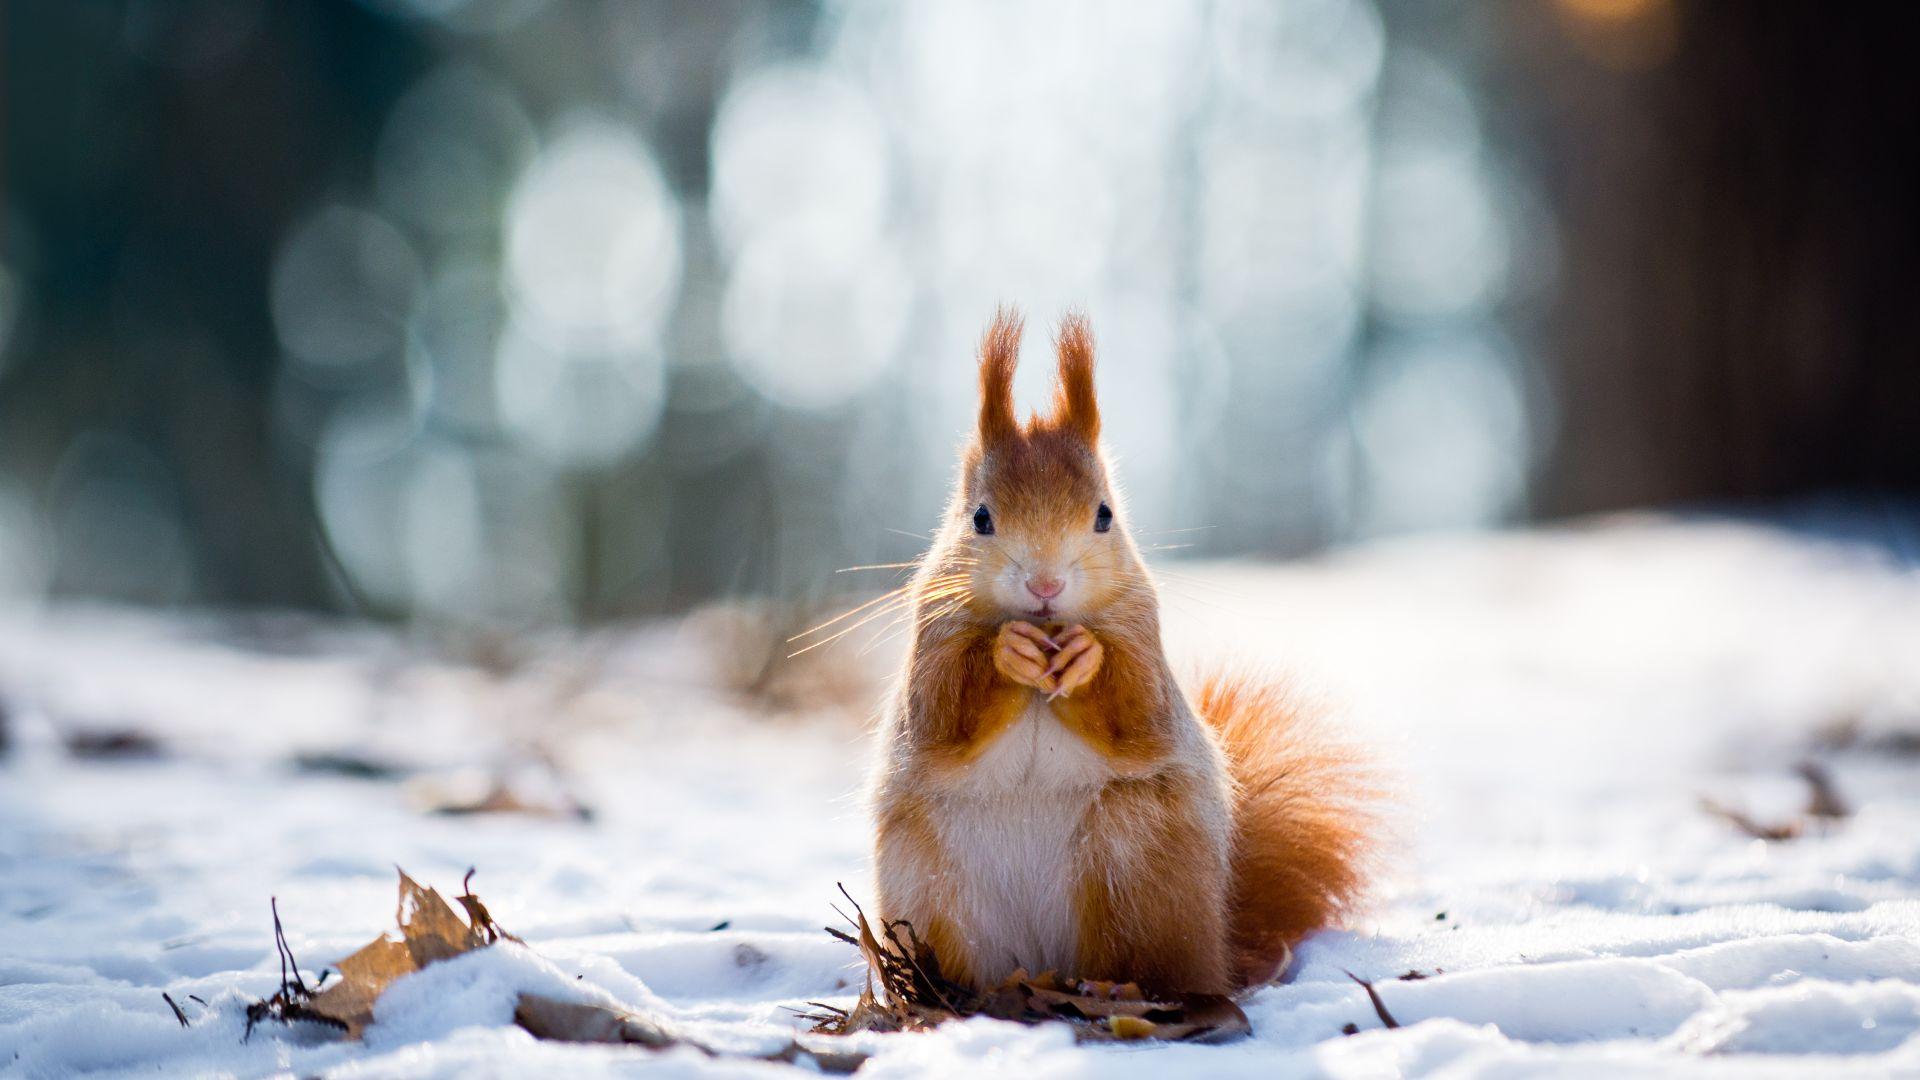 Wallpaper Squirrel Cute Animals Snow Winter 4k